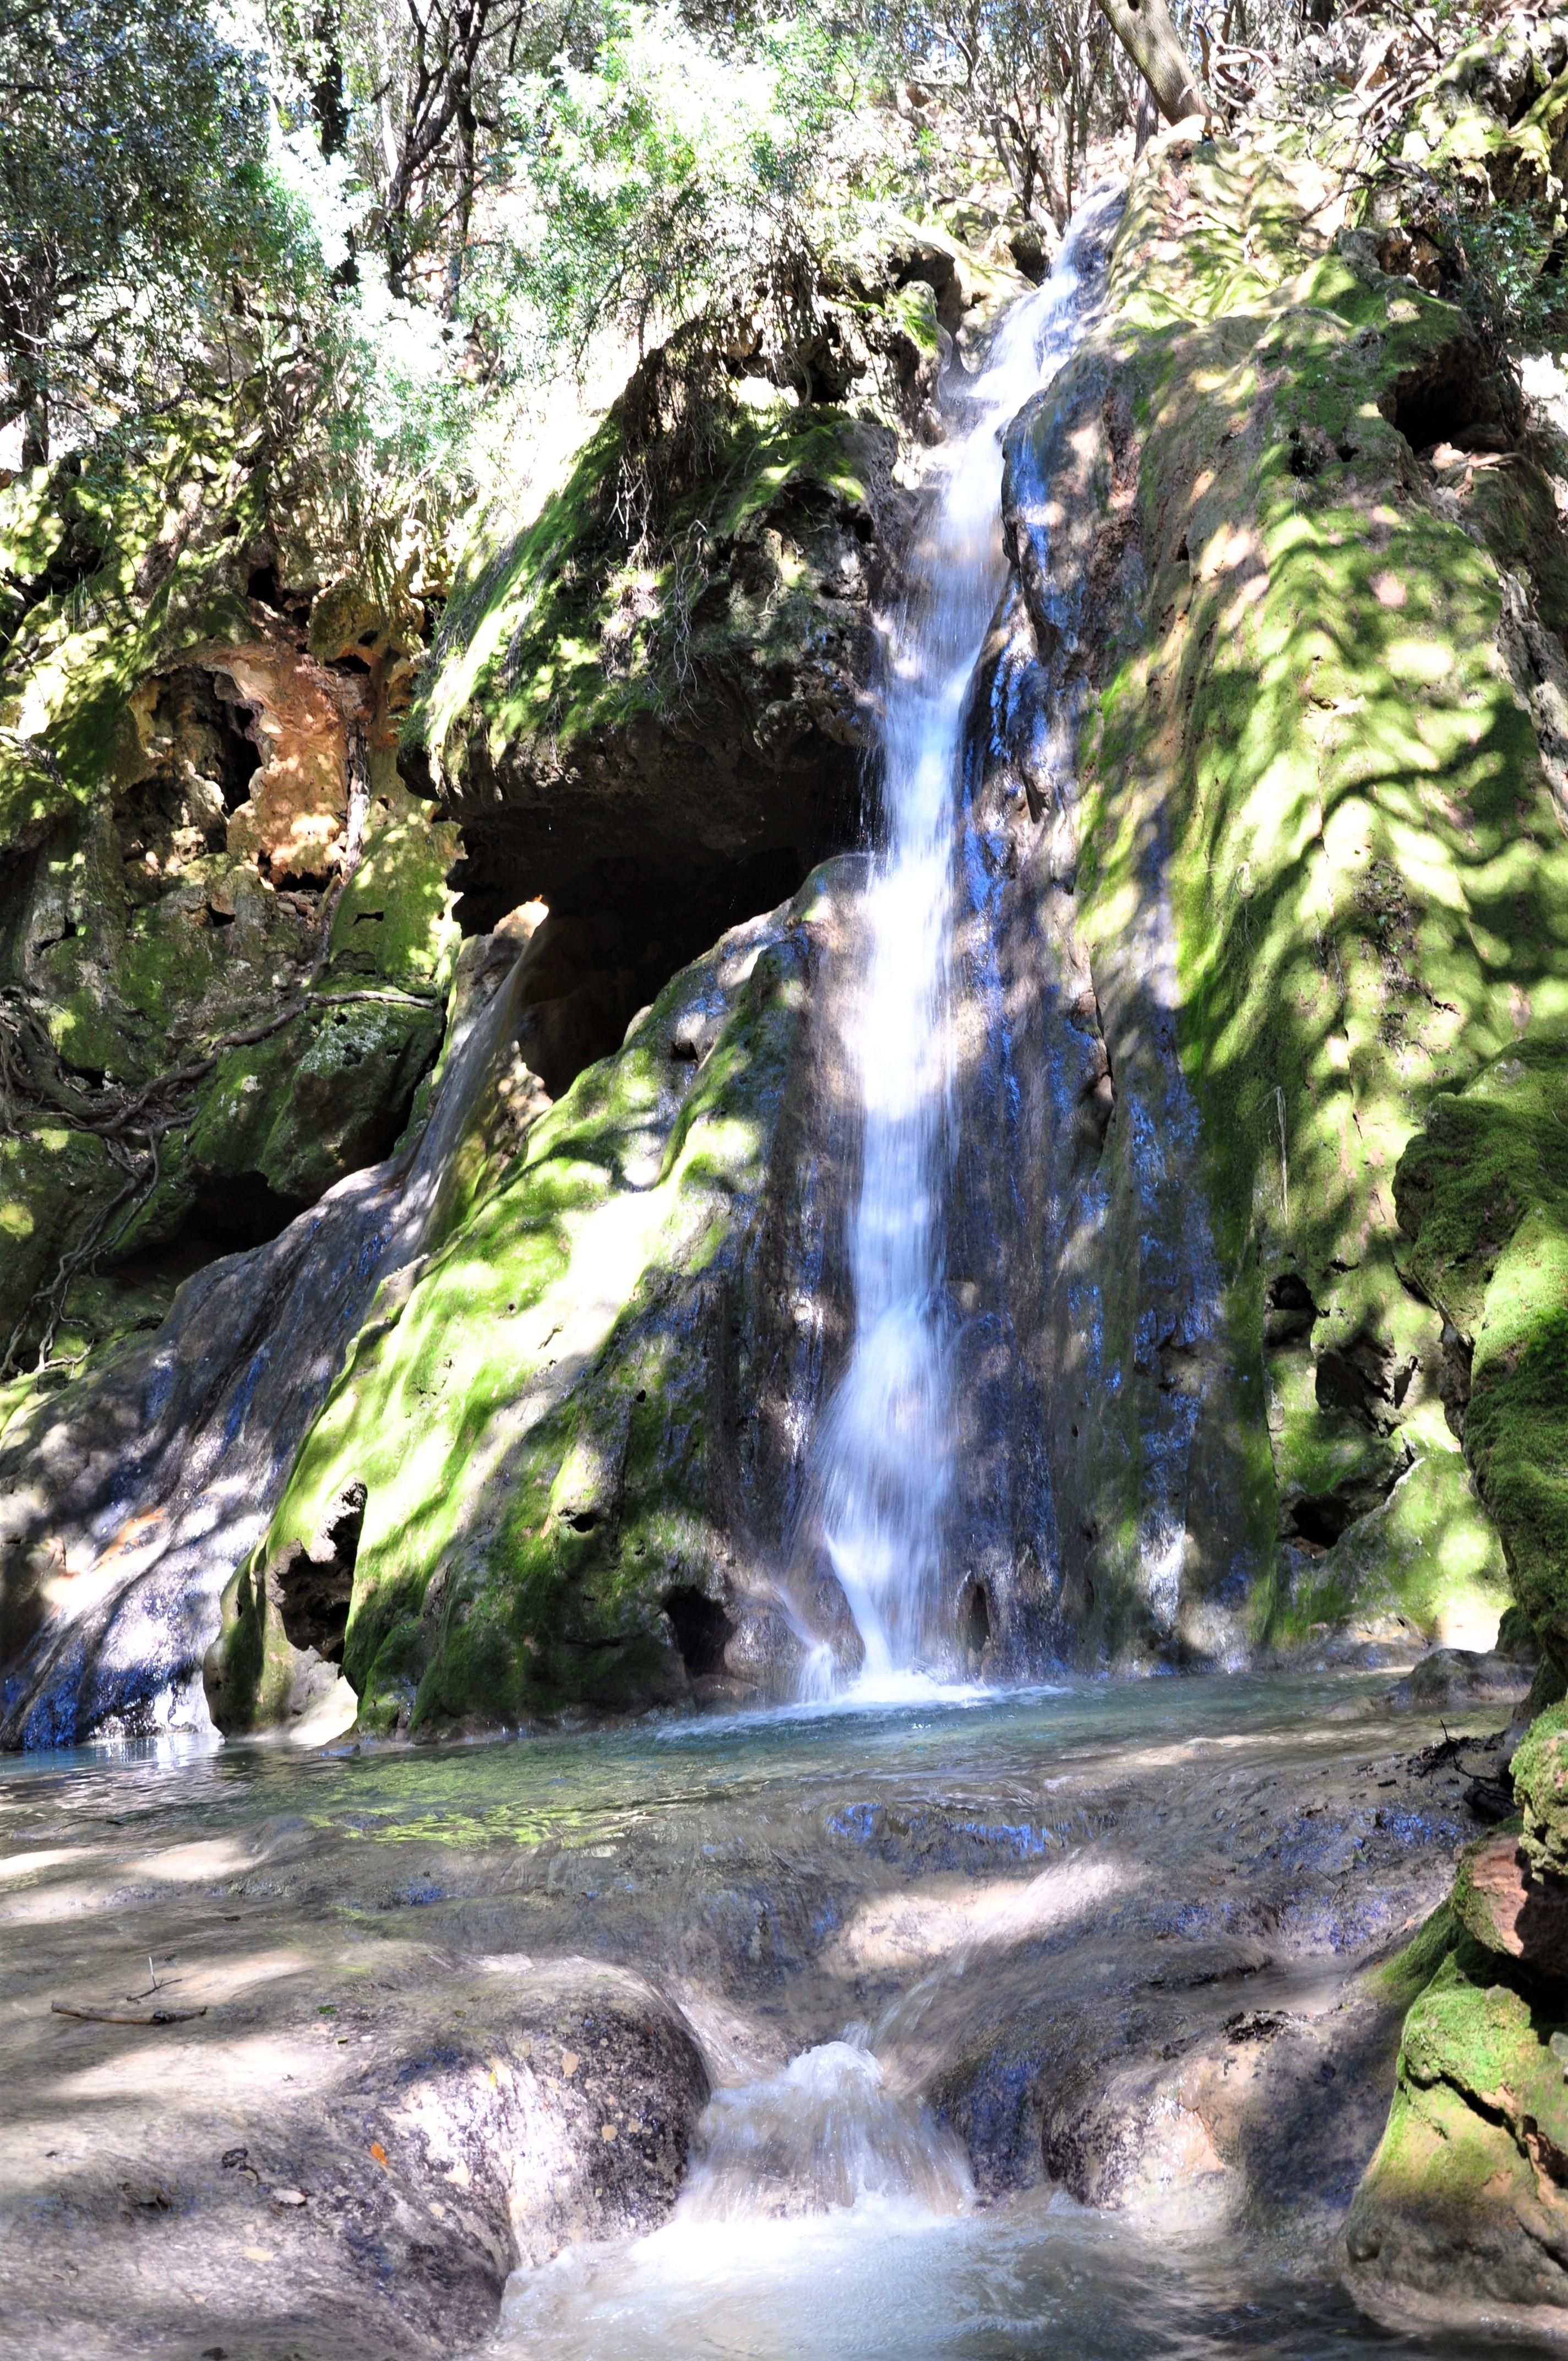 Wodospady Mallorca